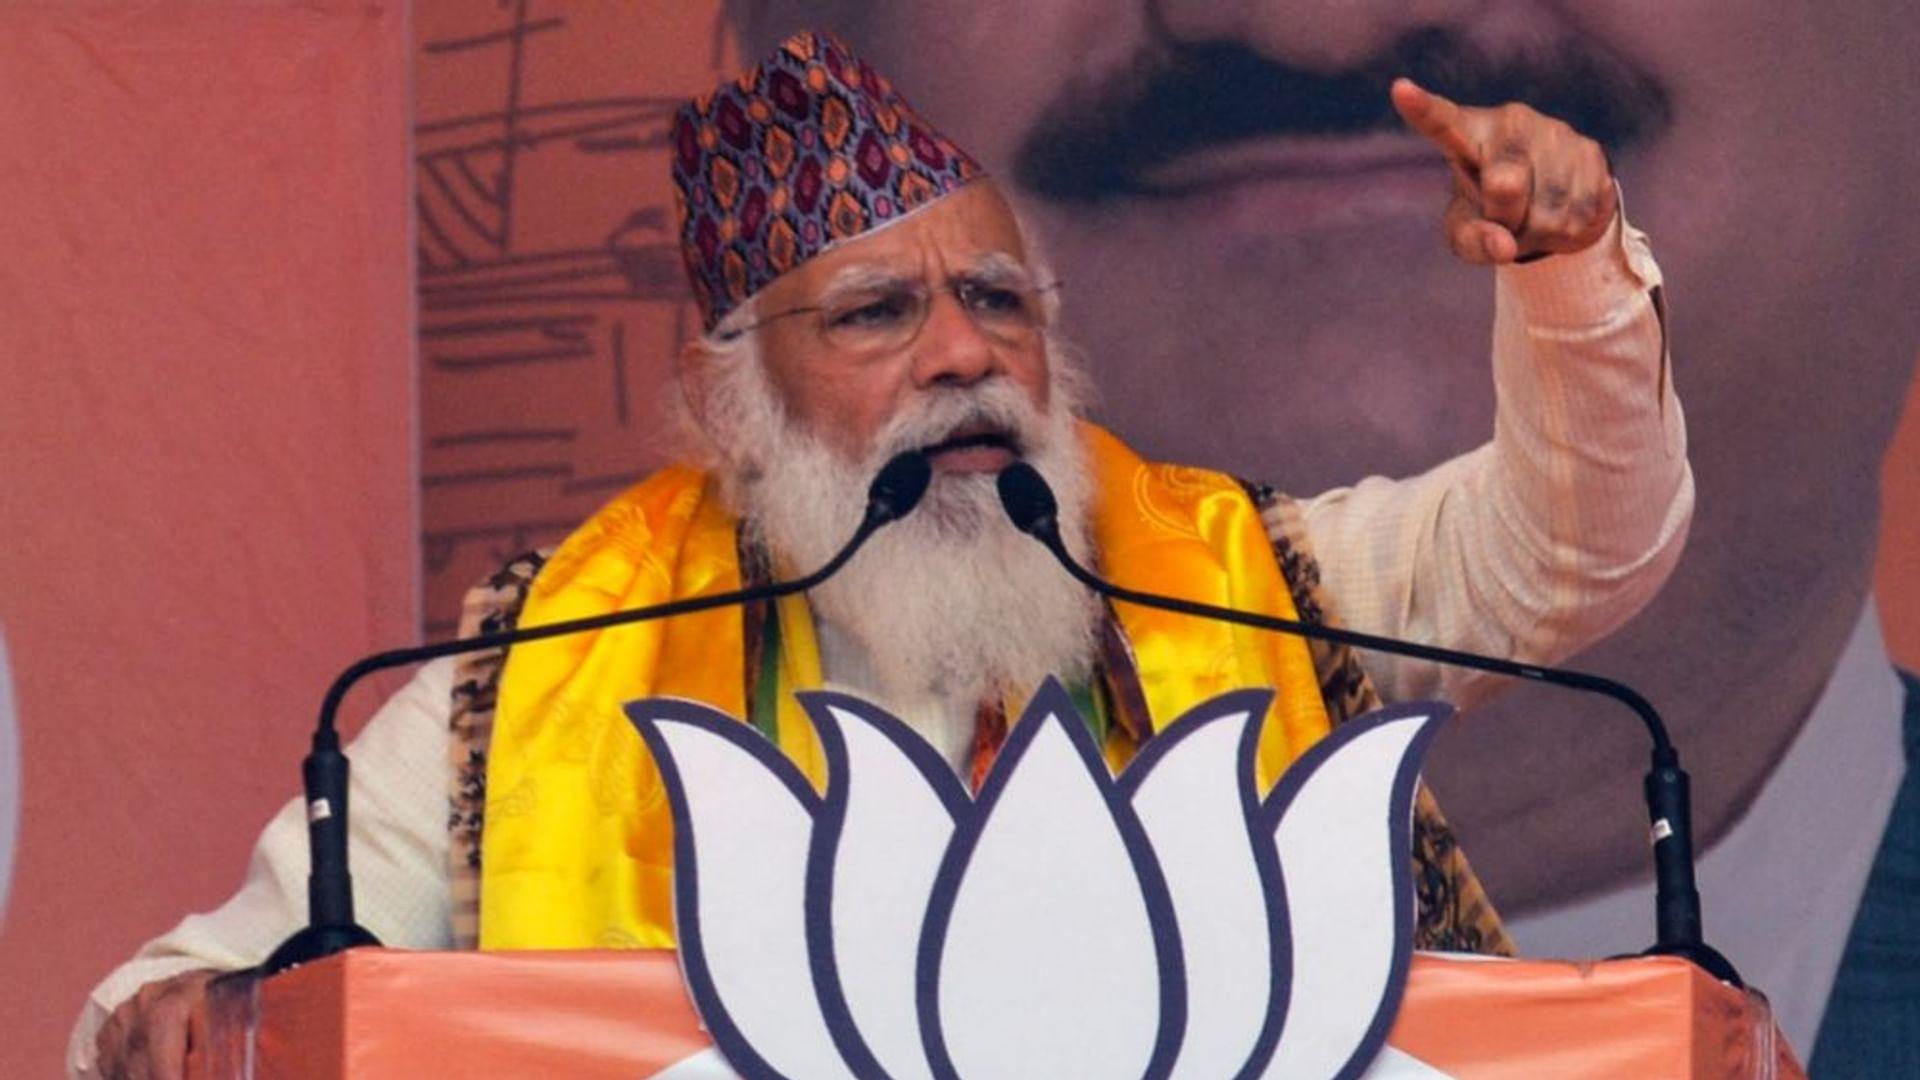 Covid-19: Indien schlittert in die Katastrophe